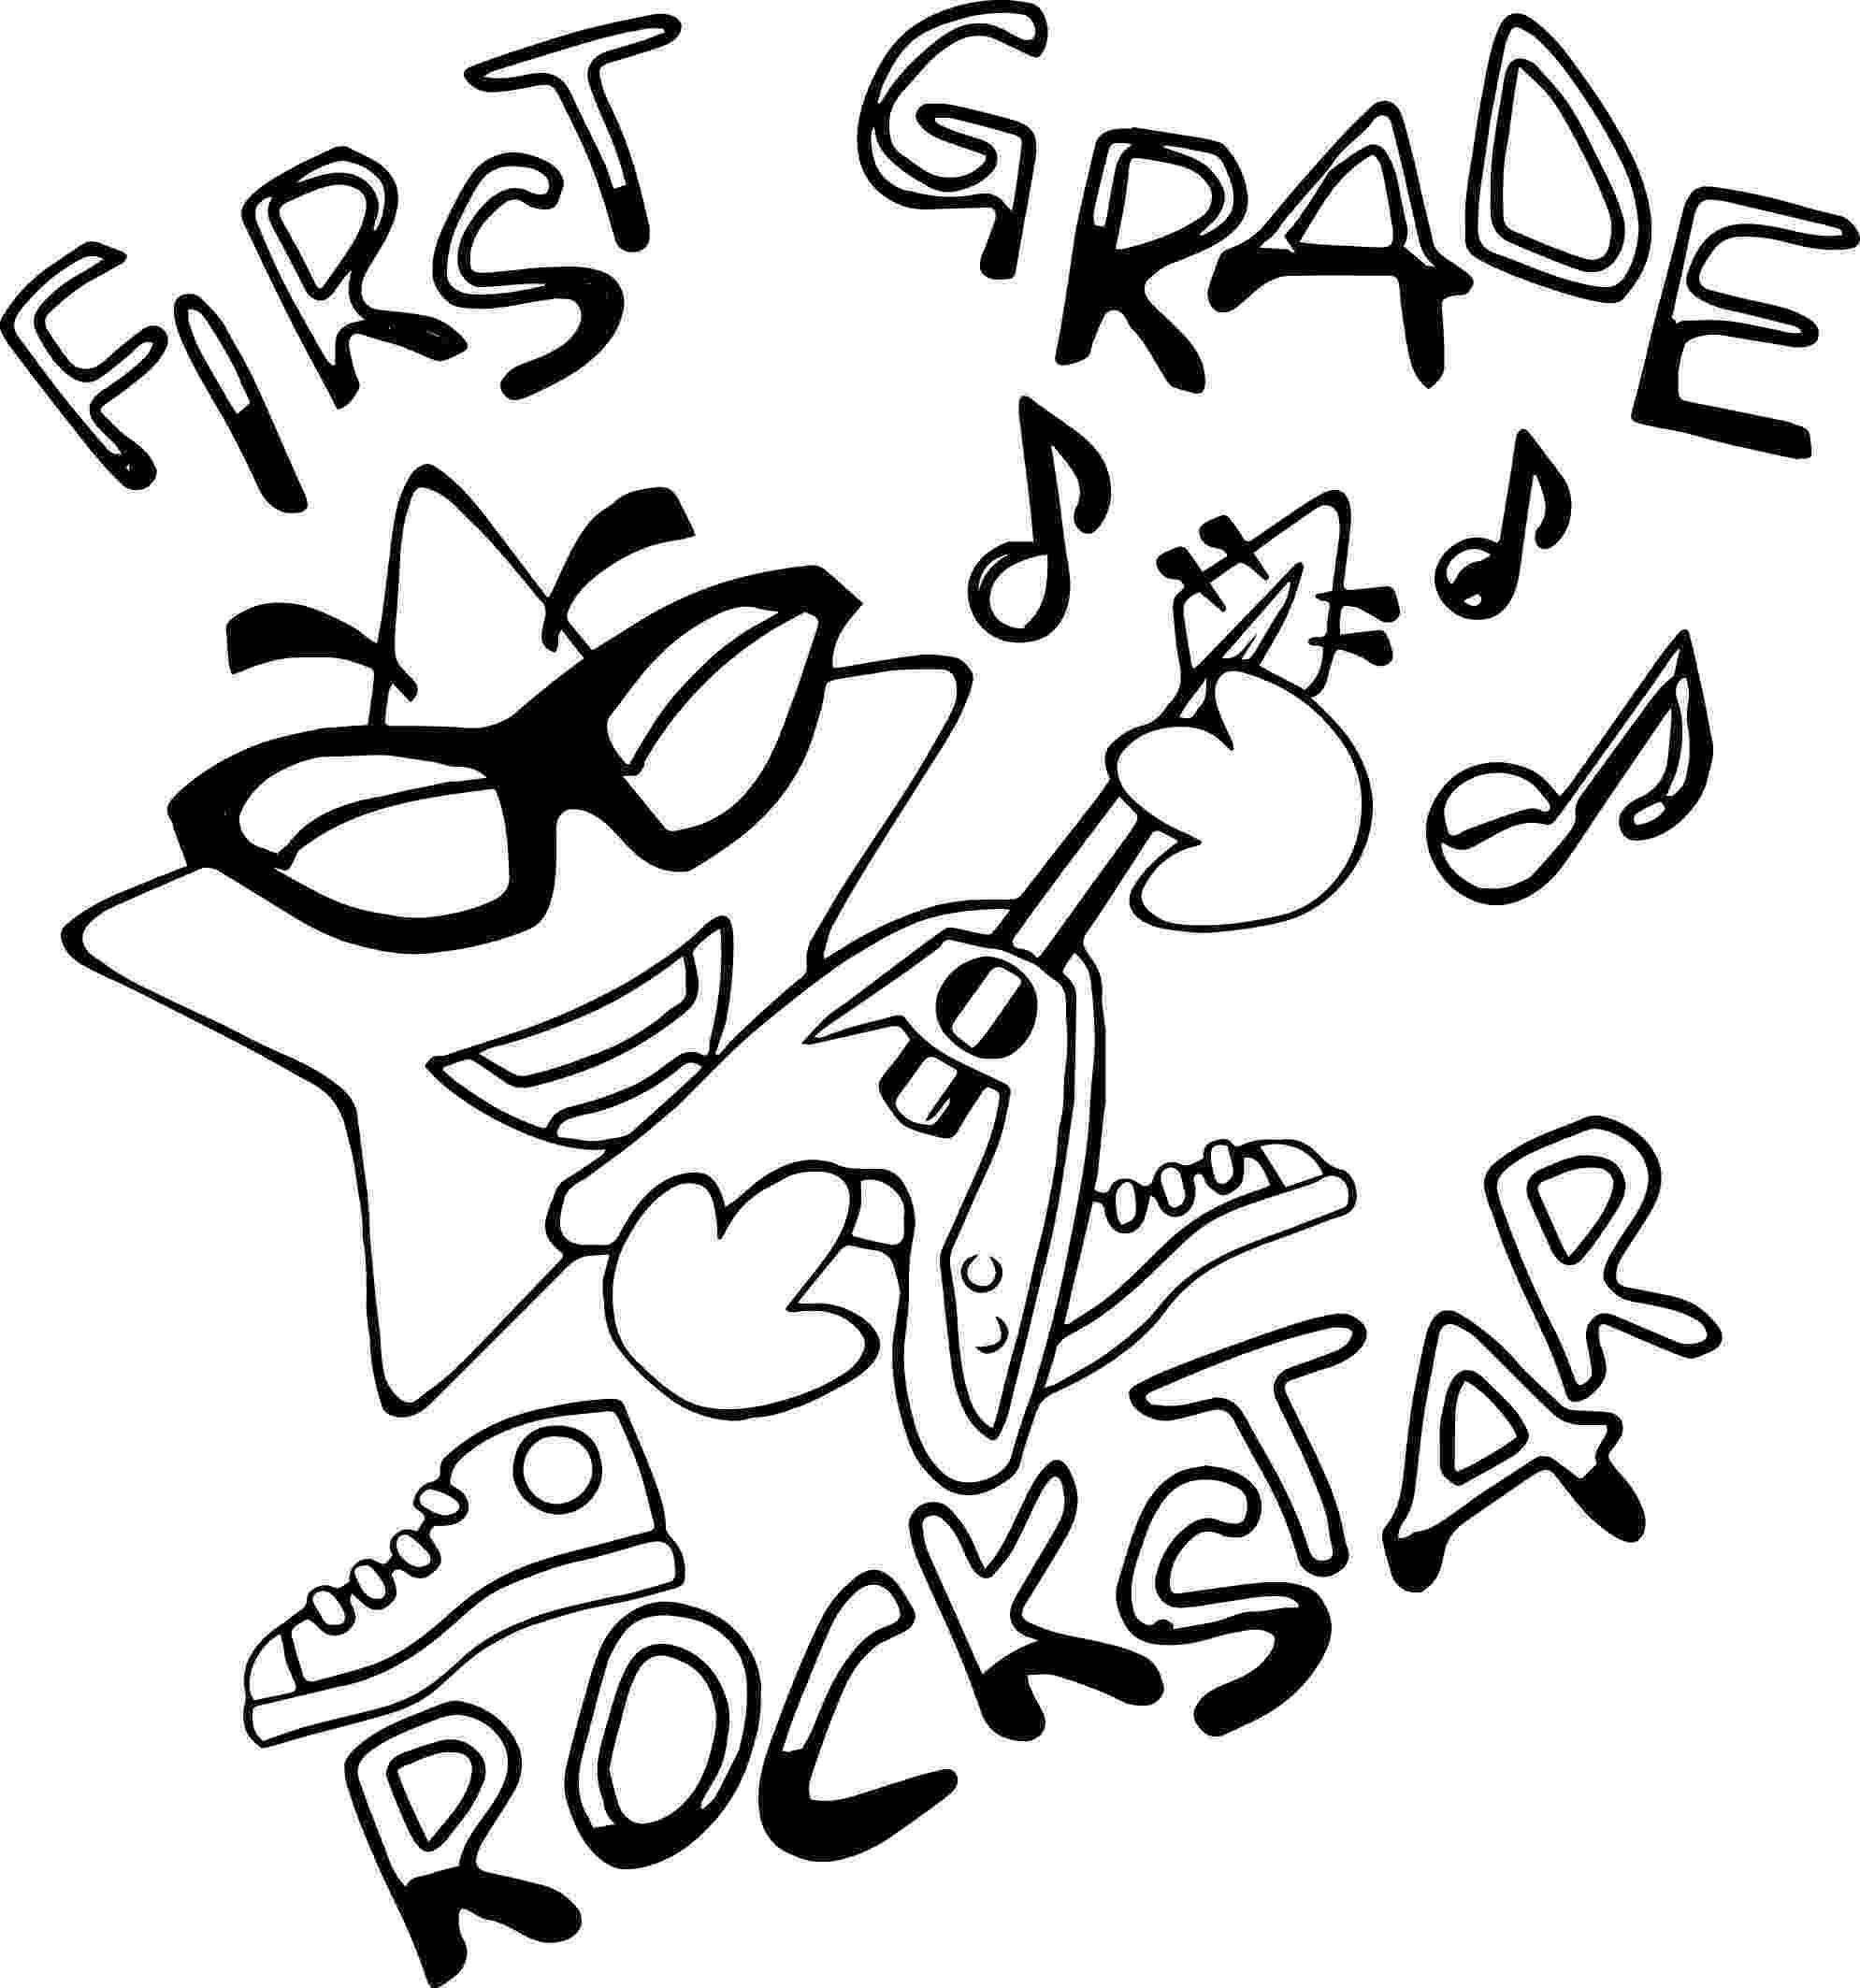 rock star coloring pages rock star coloring pages coloring star rock pages 1 1